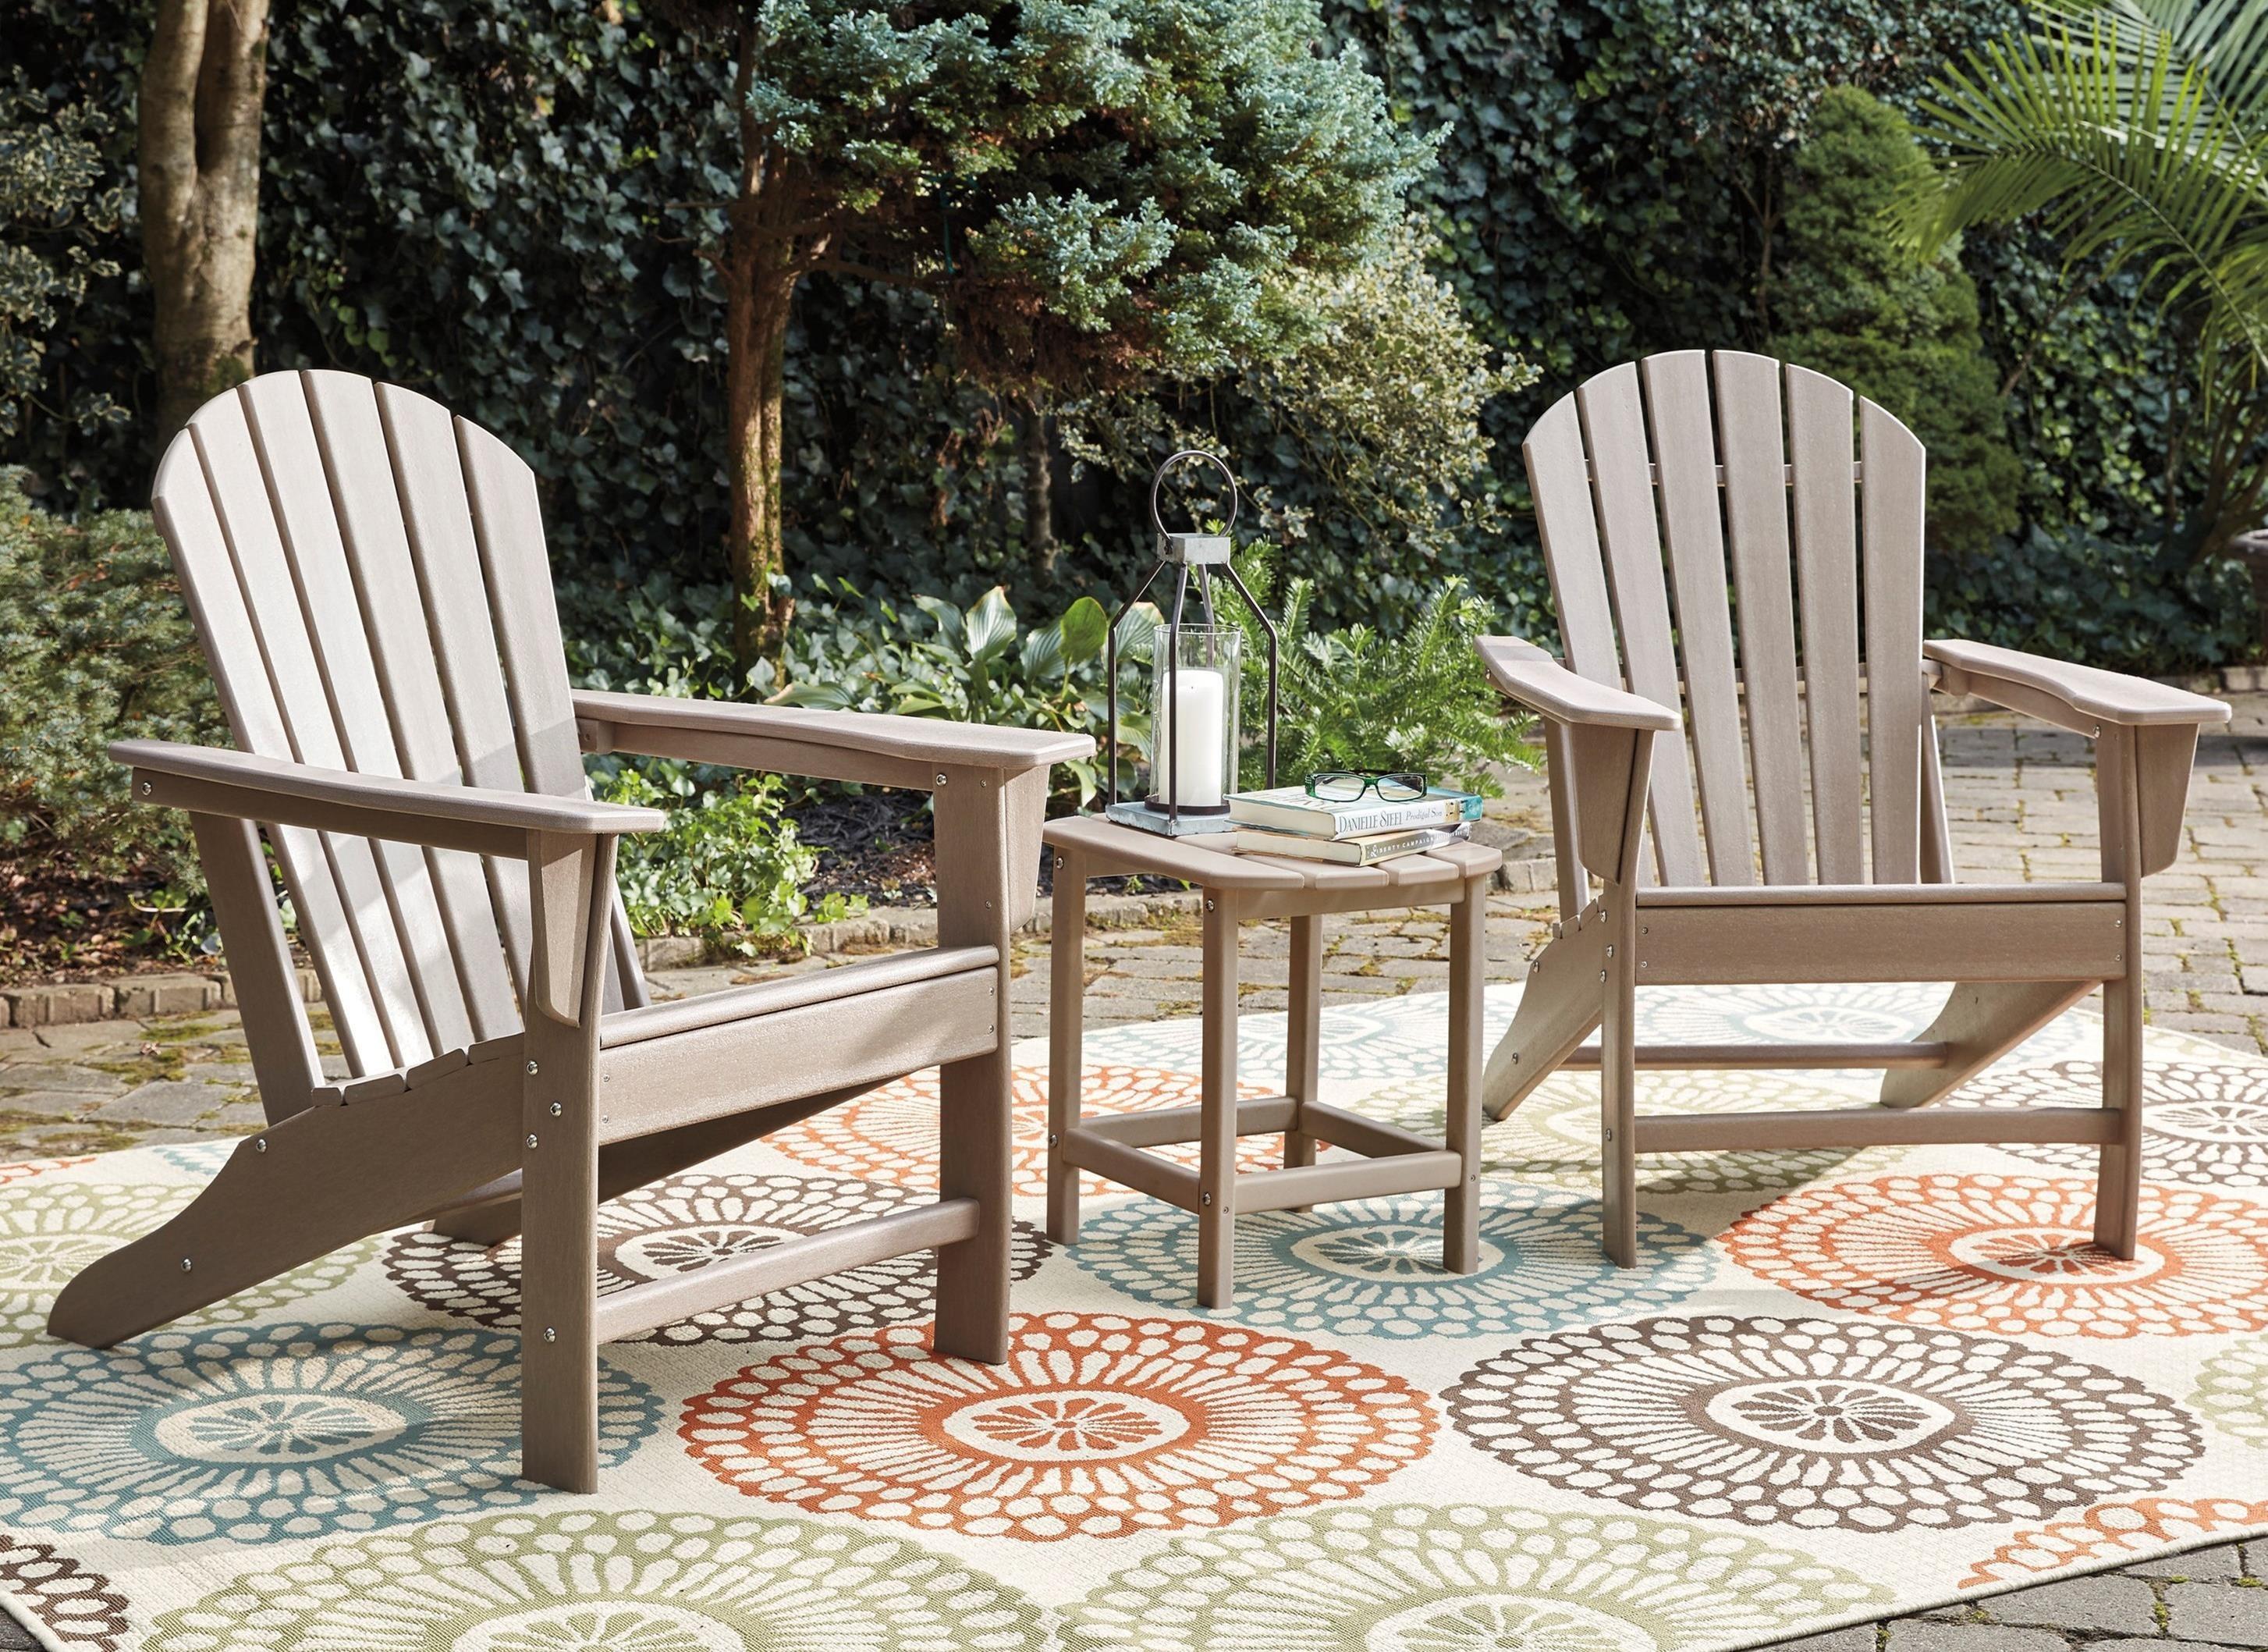 Sundown Treasure 2 Adirondack Chairs and End Table Set by Ashley (Signature Design) at Johnny Janosik